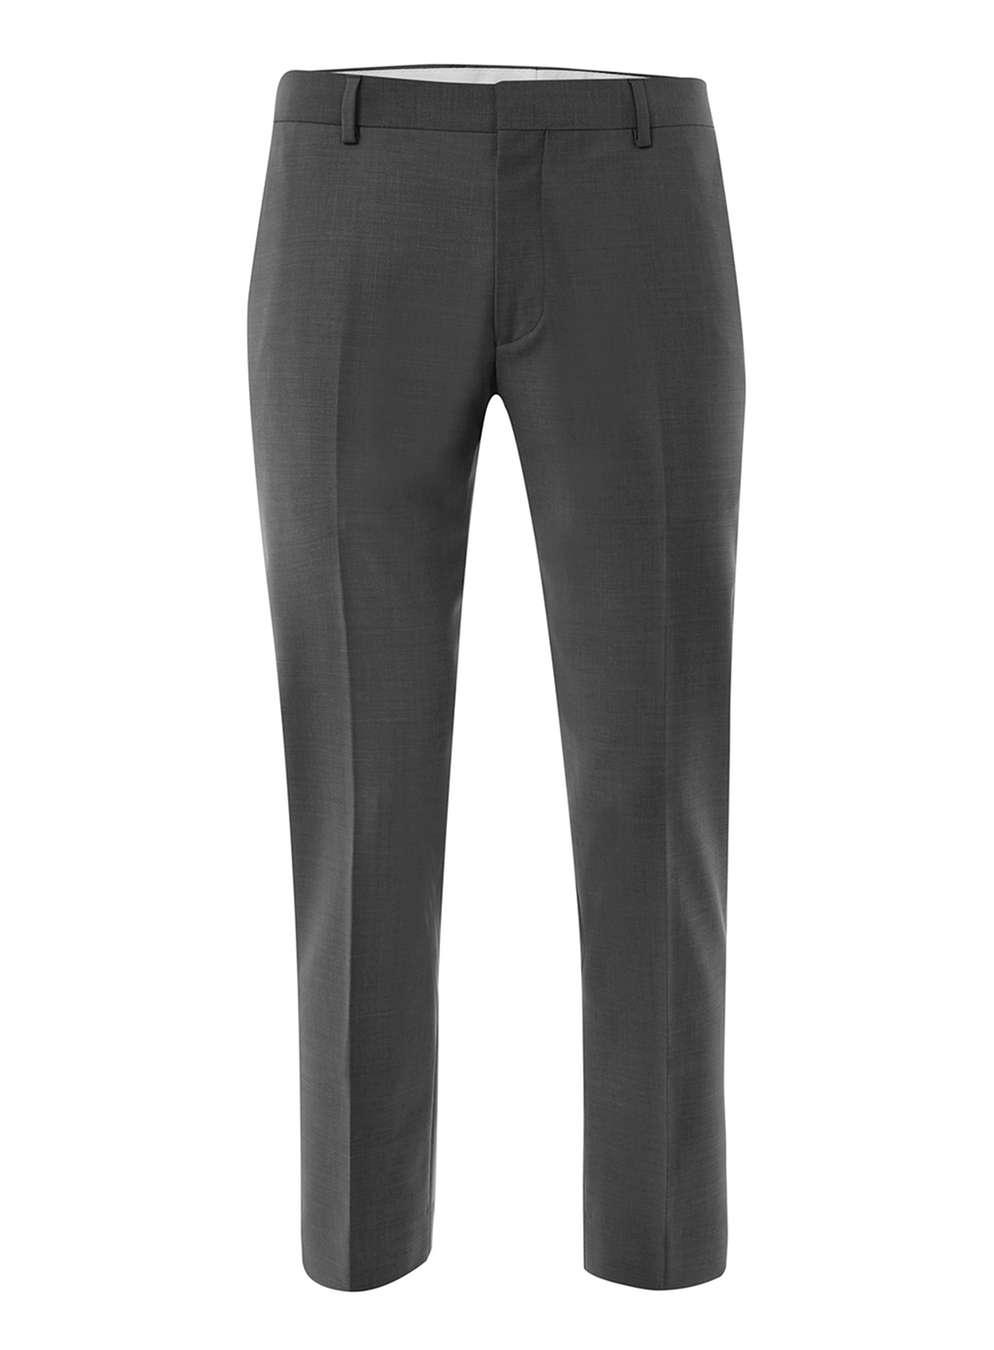 TOPMAN PREMIUM Grey Skinny Fit Cropped Trousers , £45